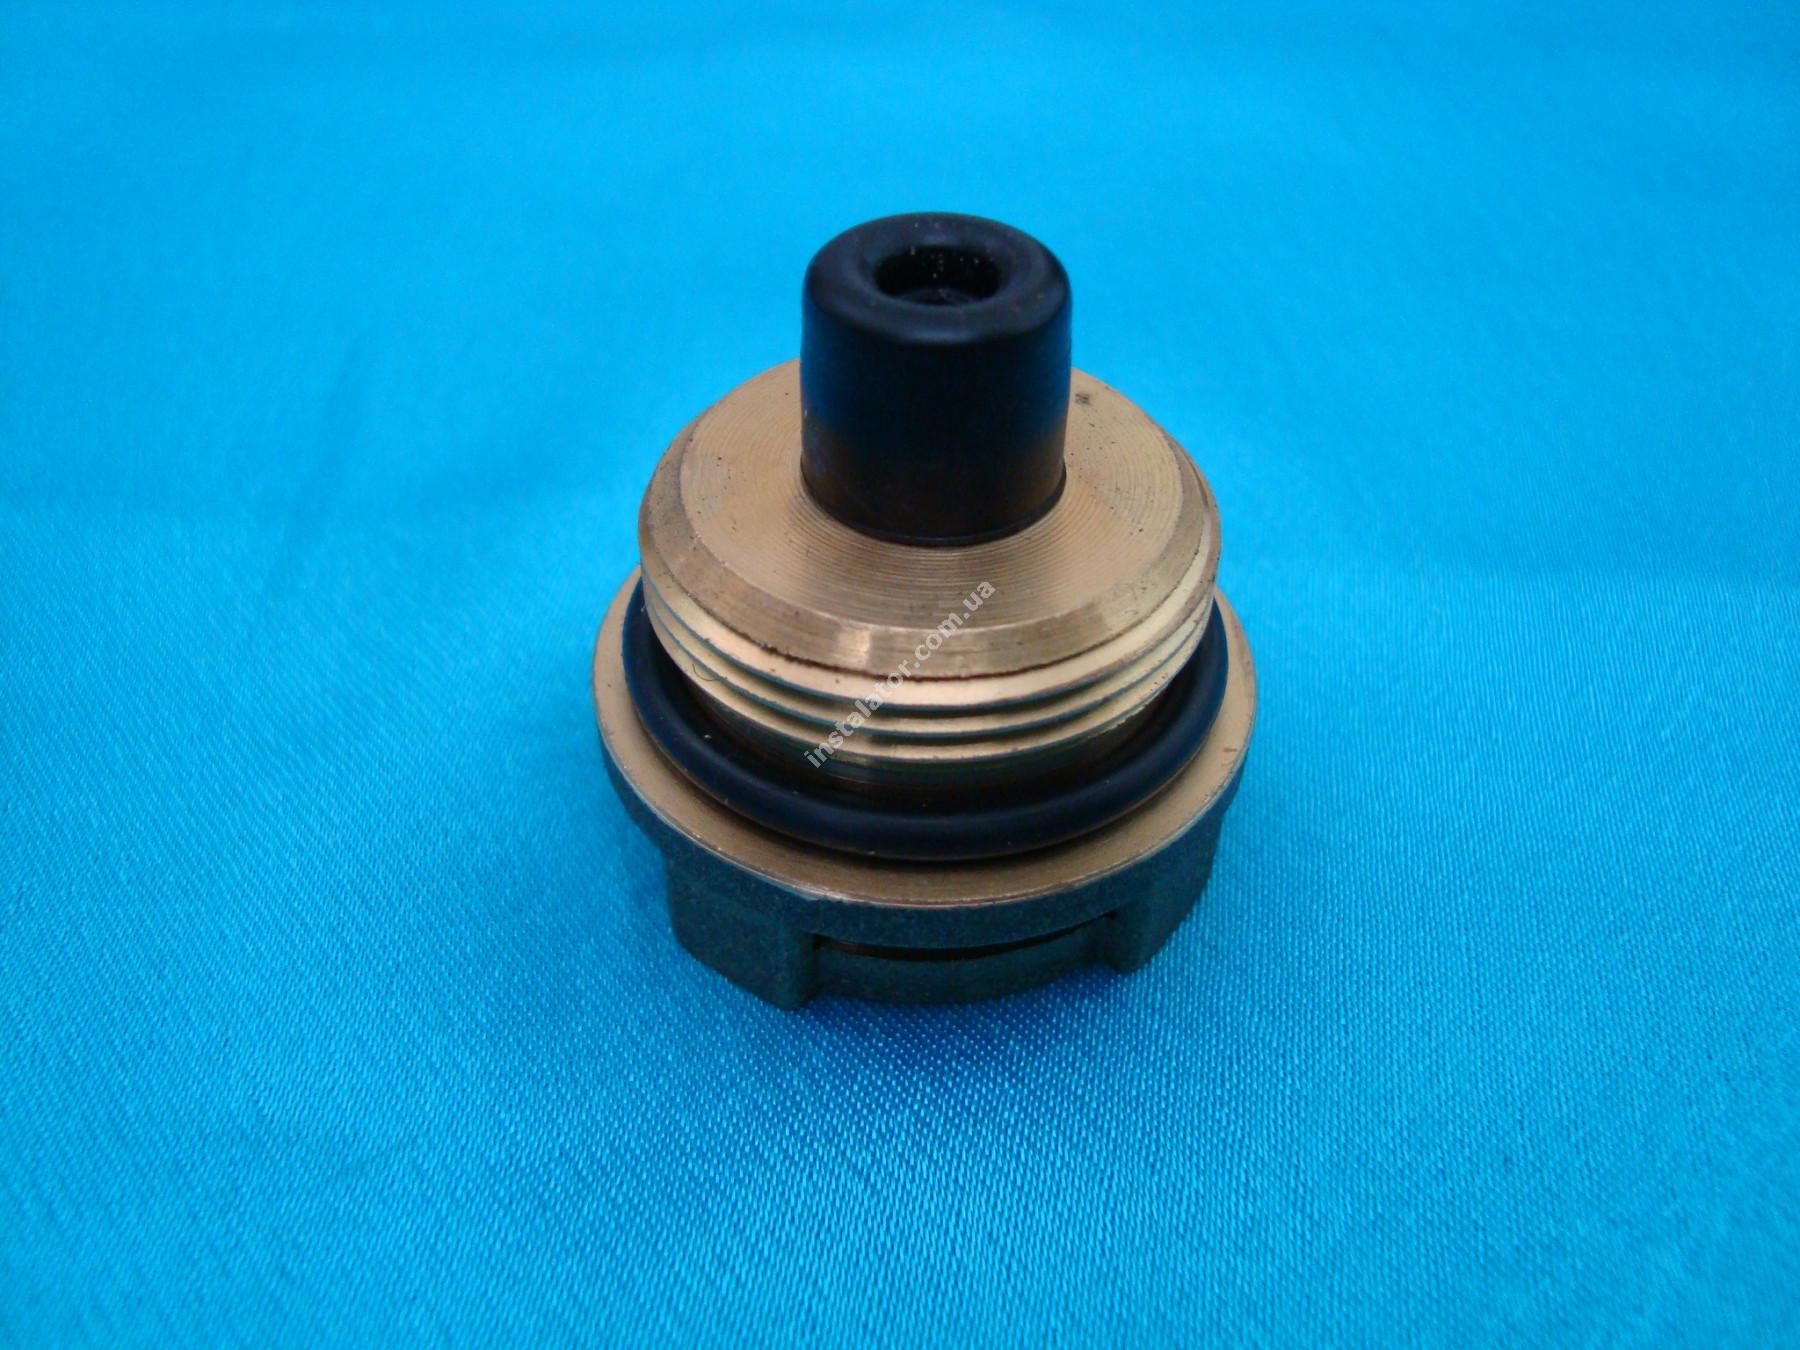 600750 Втулка 3-х ходового клапана FUGAS full-image-0